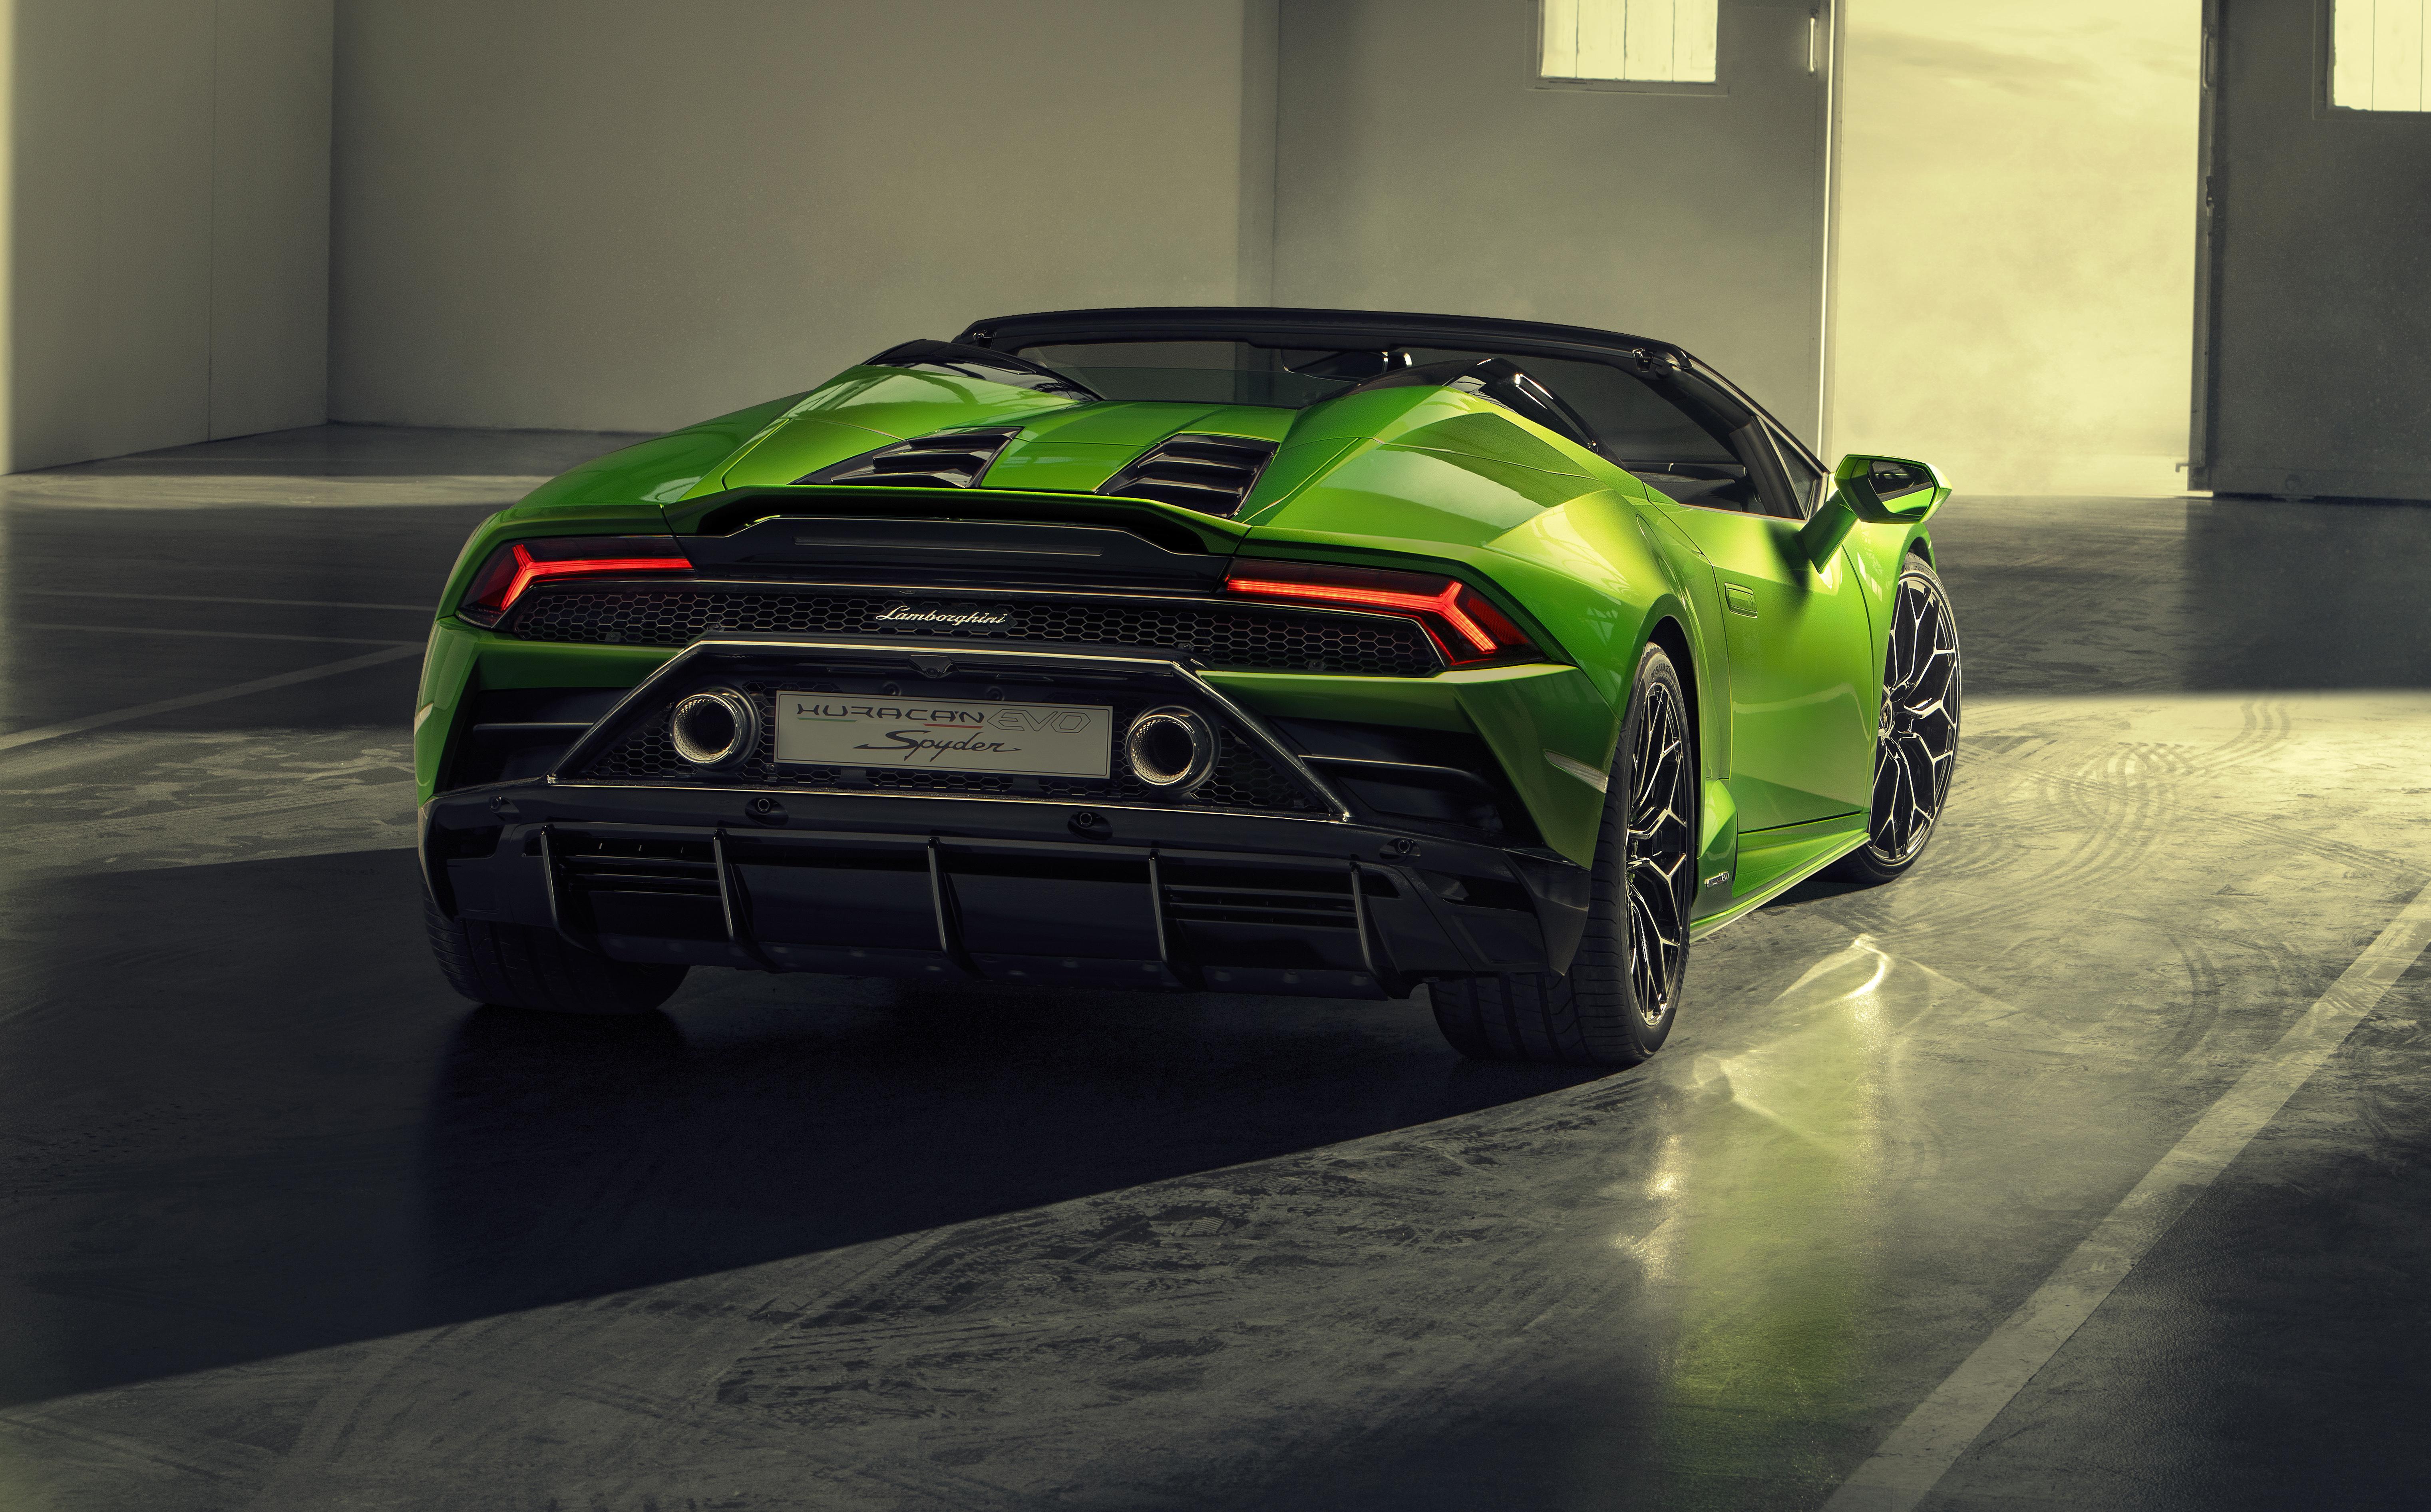 2019 Lamborghini Huracan Evo Spyder Rear View 5k, HD Cars